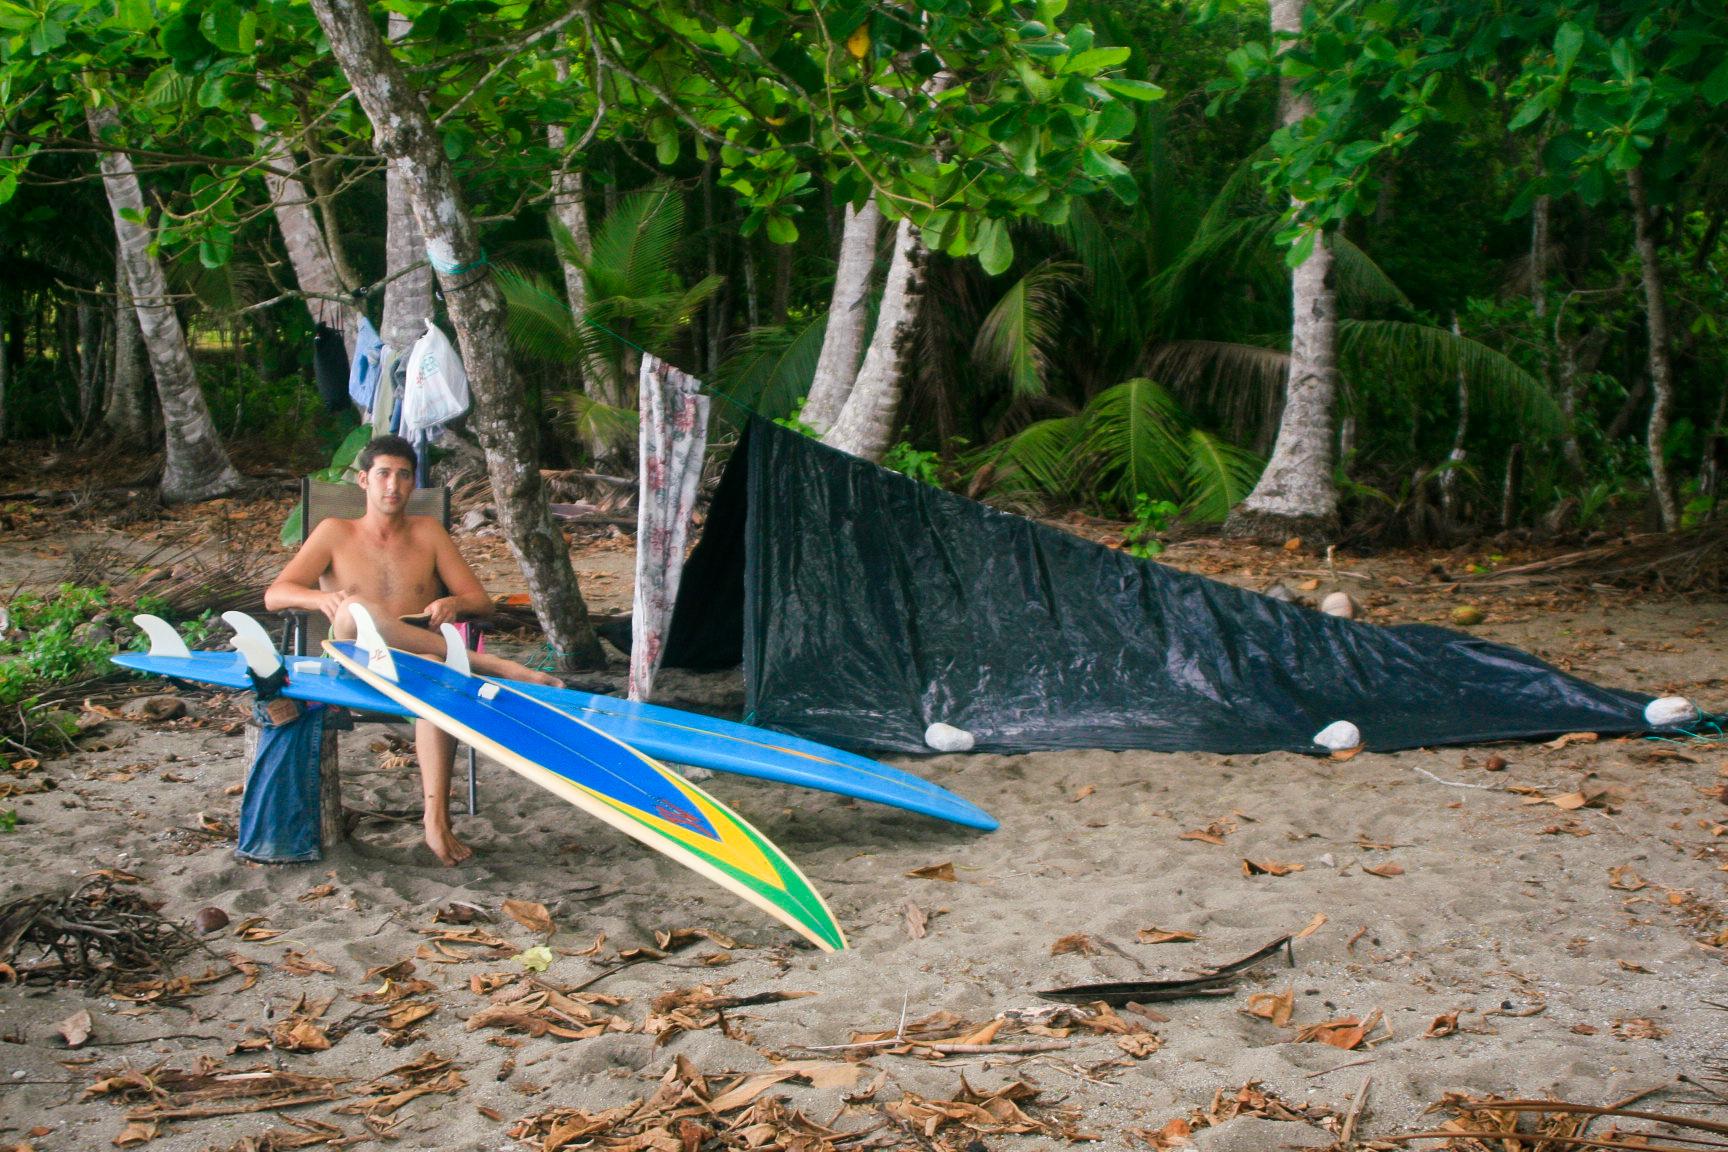 wandering_study_adventure_videographer_costa_rica_beach_camping